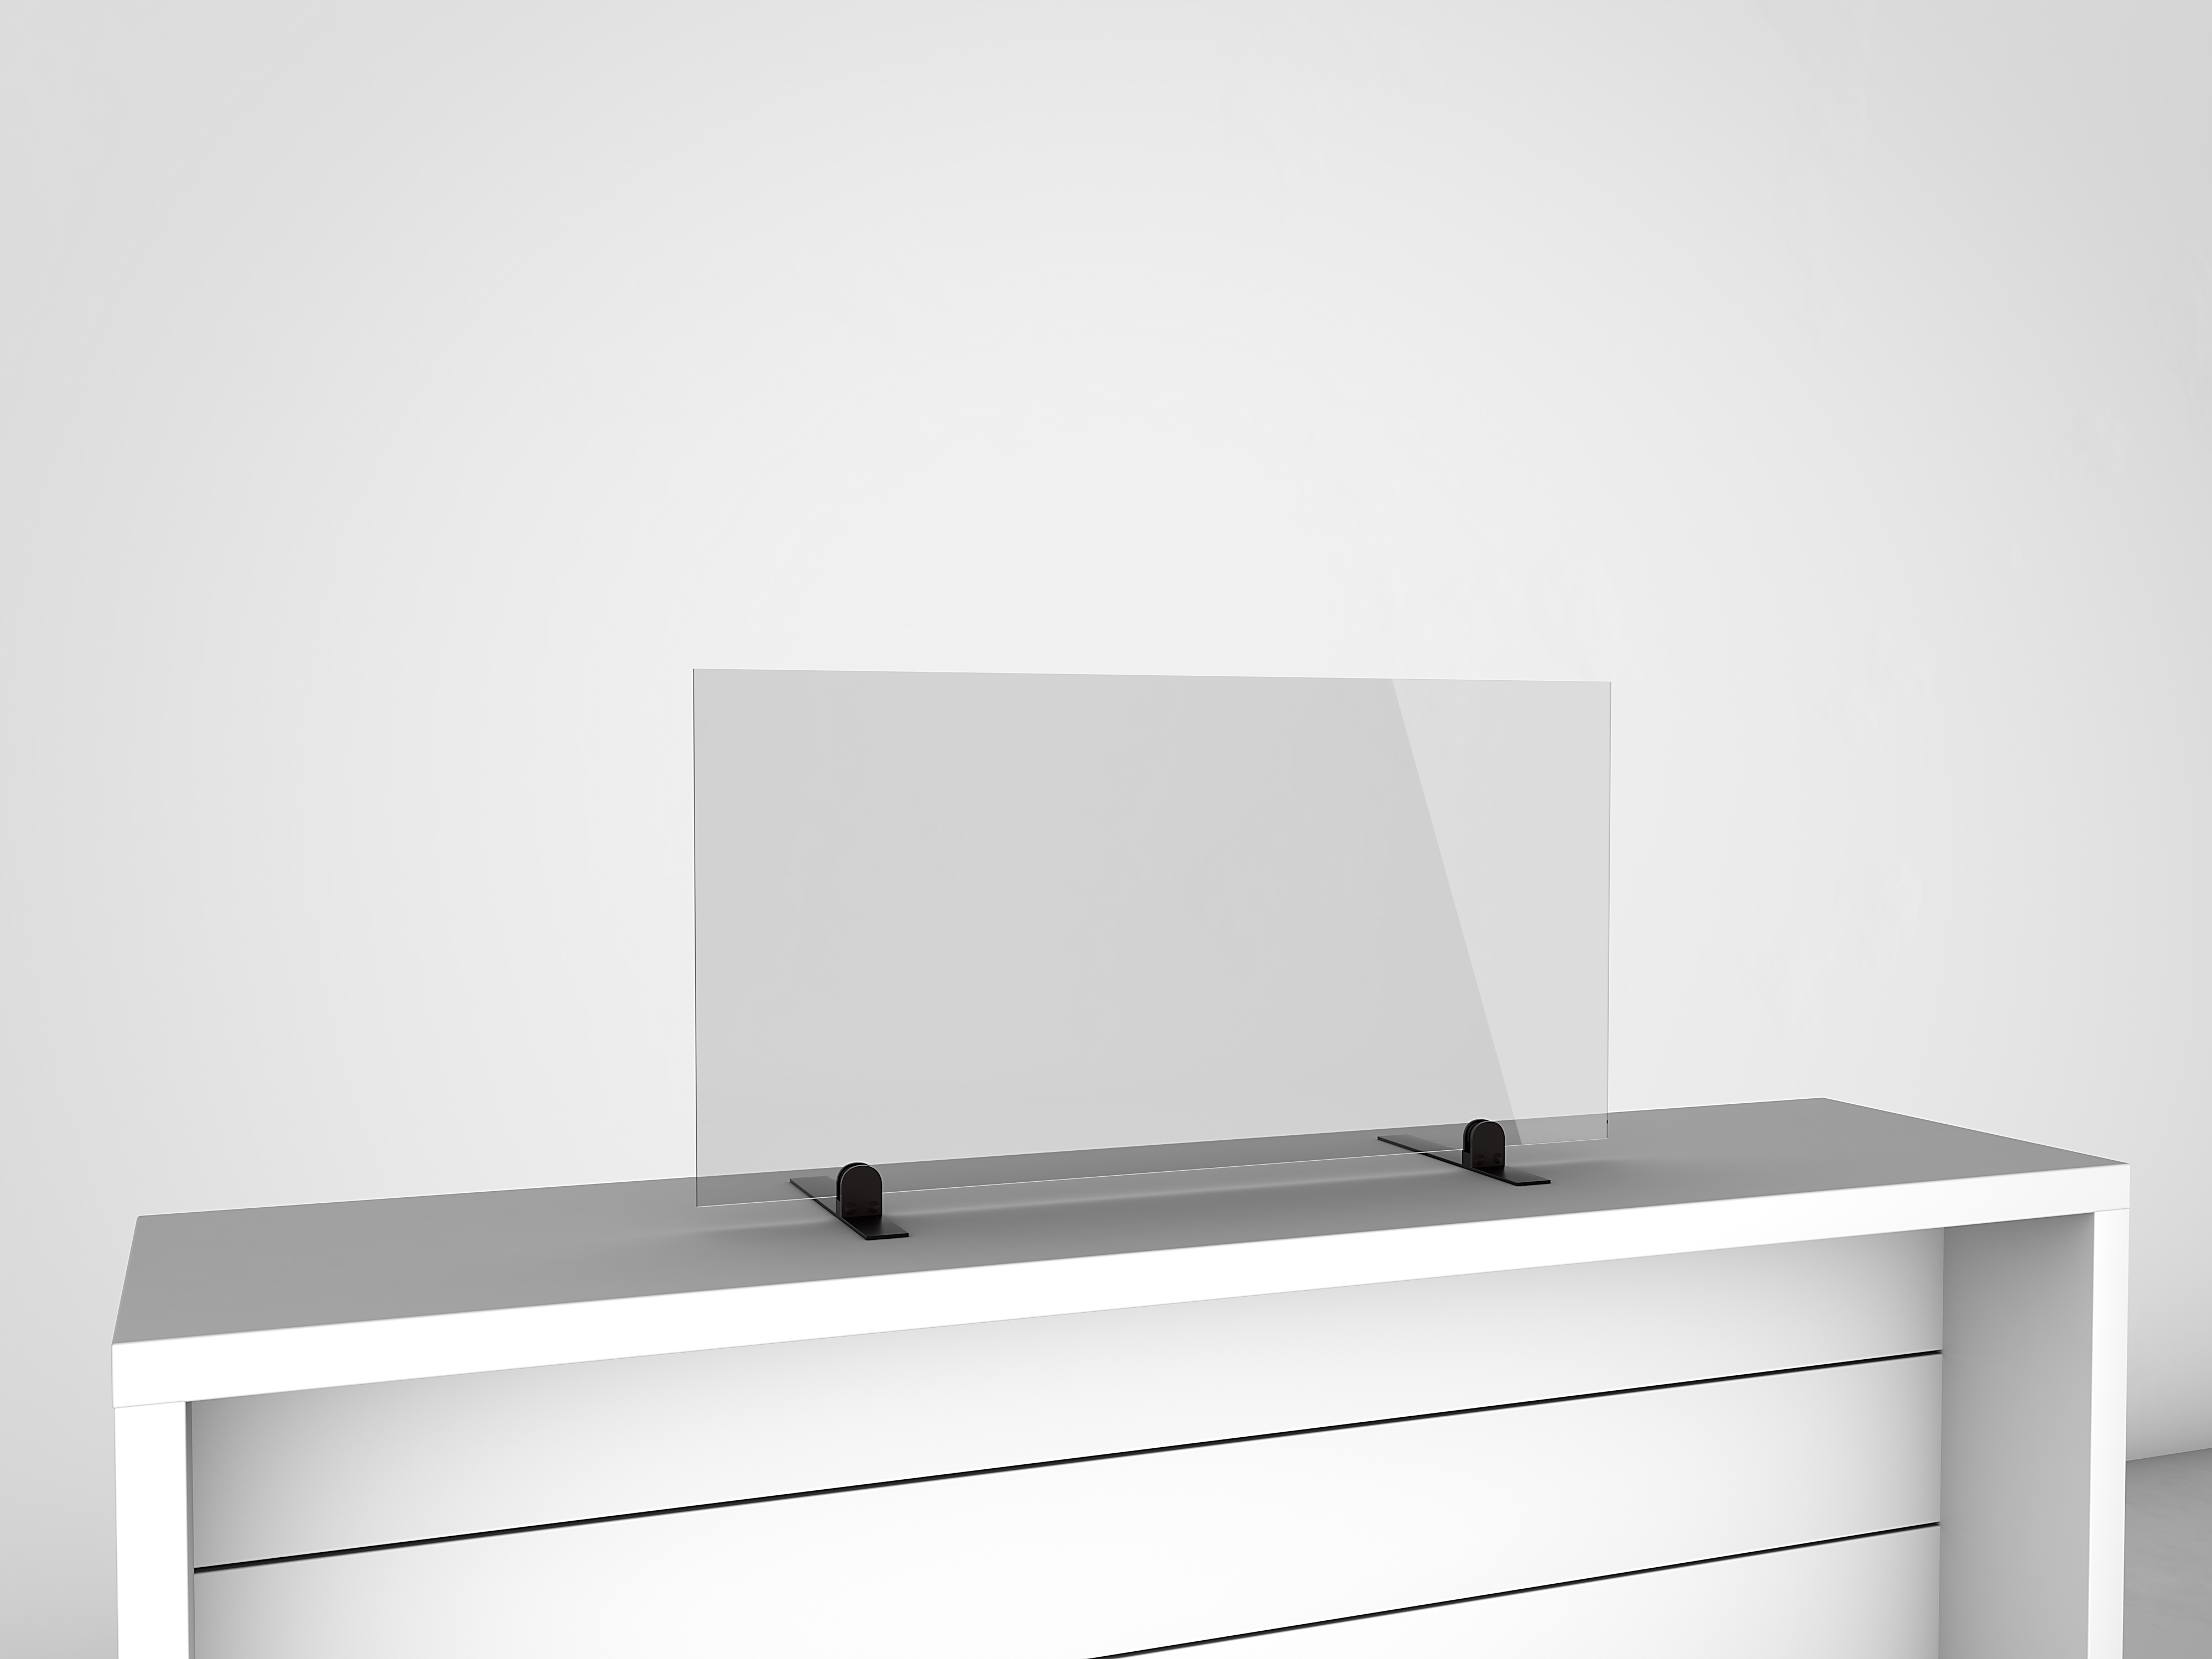 Gutta Spuckschutzwand Premium 1000 x 500 x 6 mm